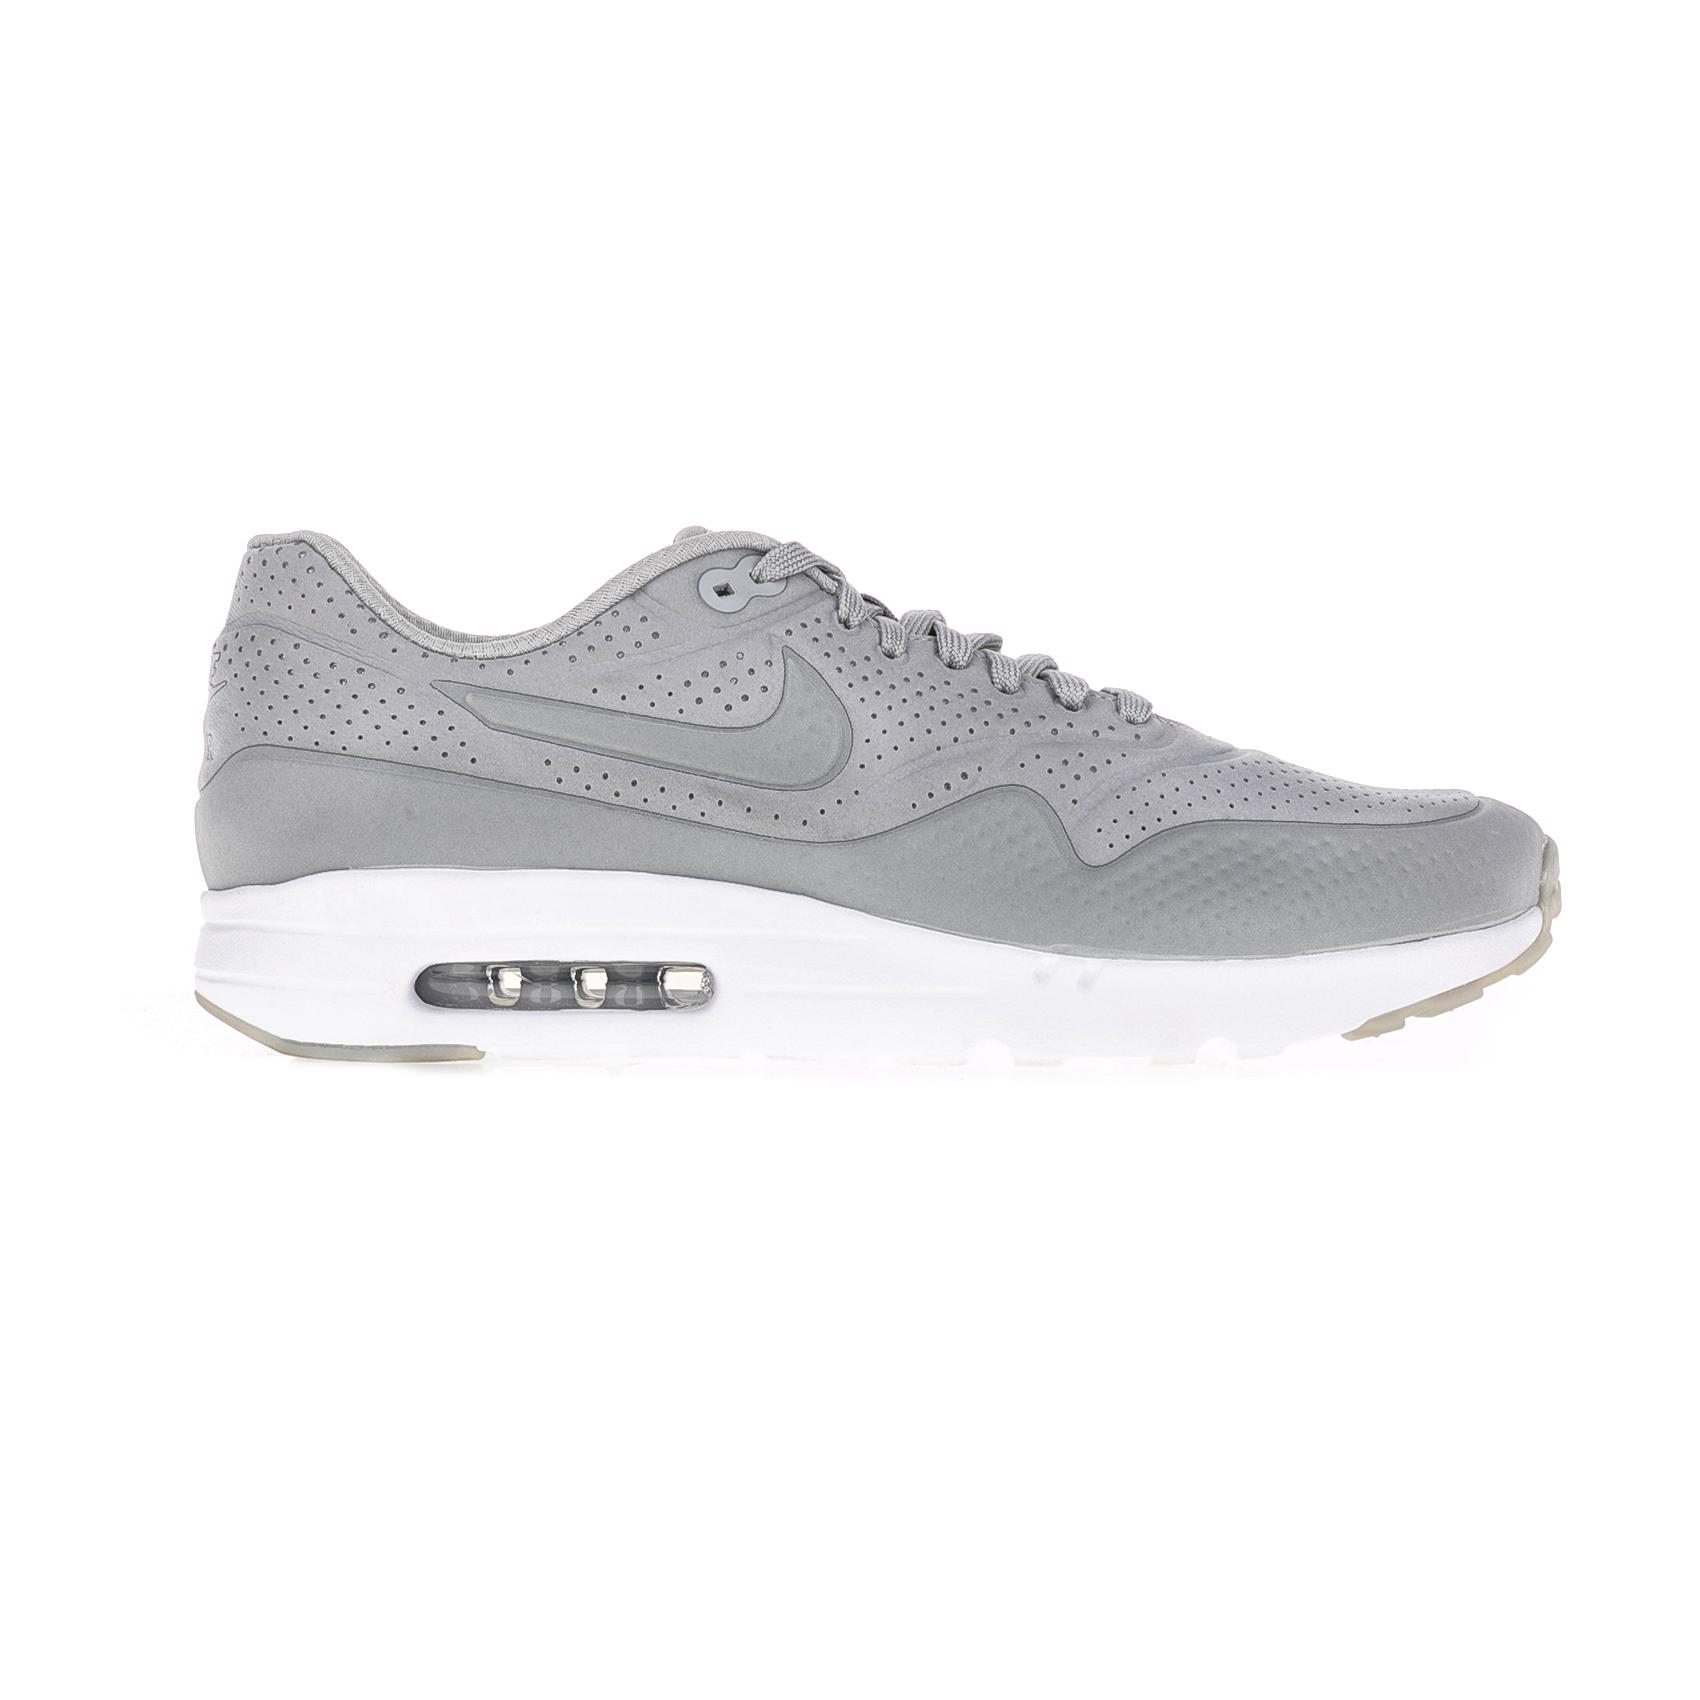 NIKE – Ανδρικά αθλητικά παπούτσια NIKE AIR MAX 1 ULTRA MOIRE γκρι-λευκά